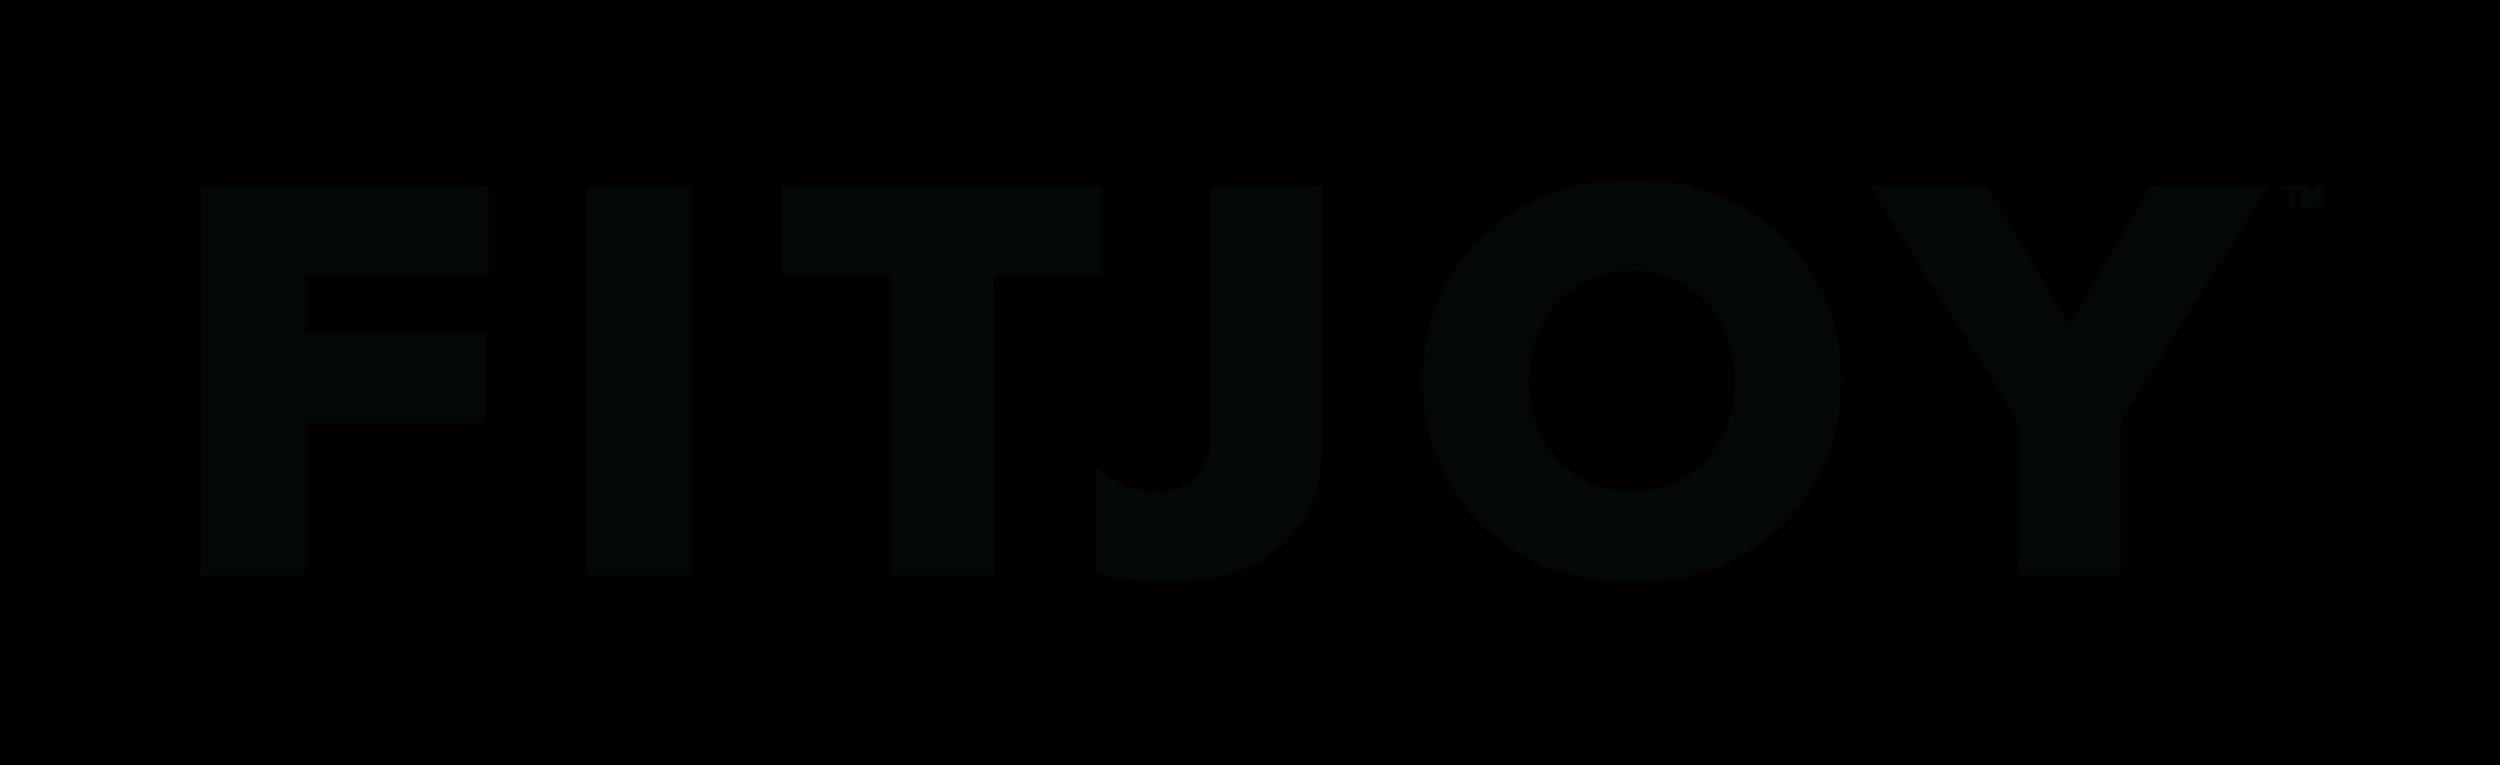 FitJoy Logo - Black-01 (1) (2).png